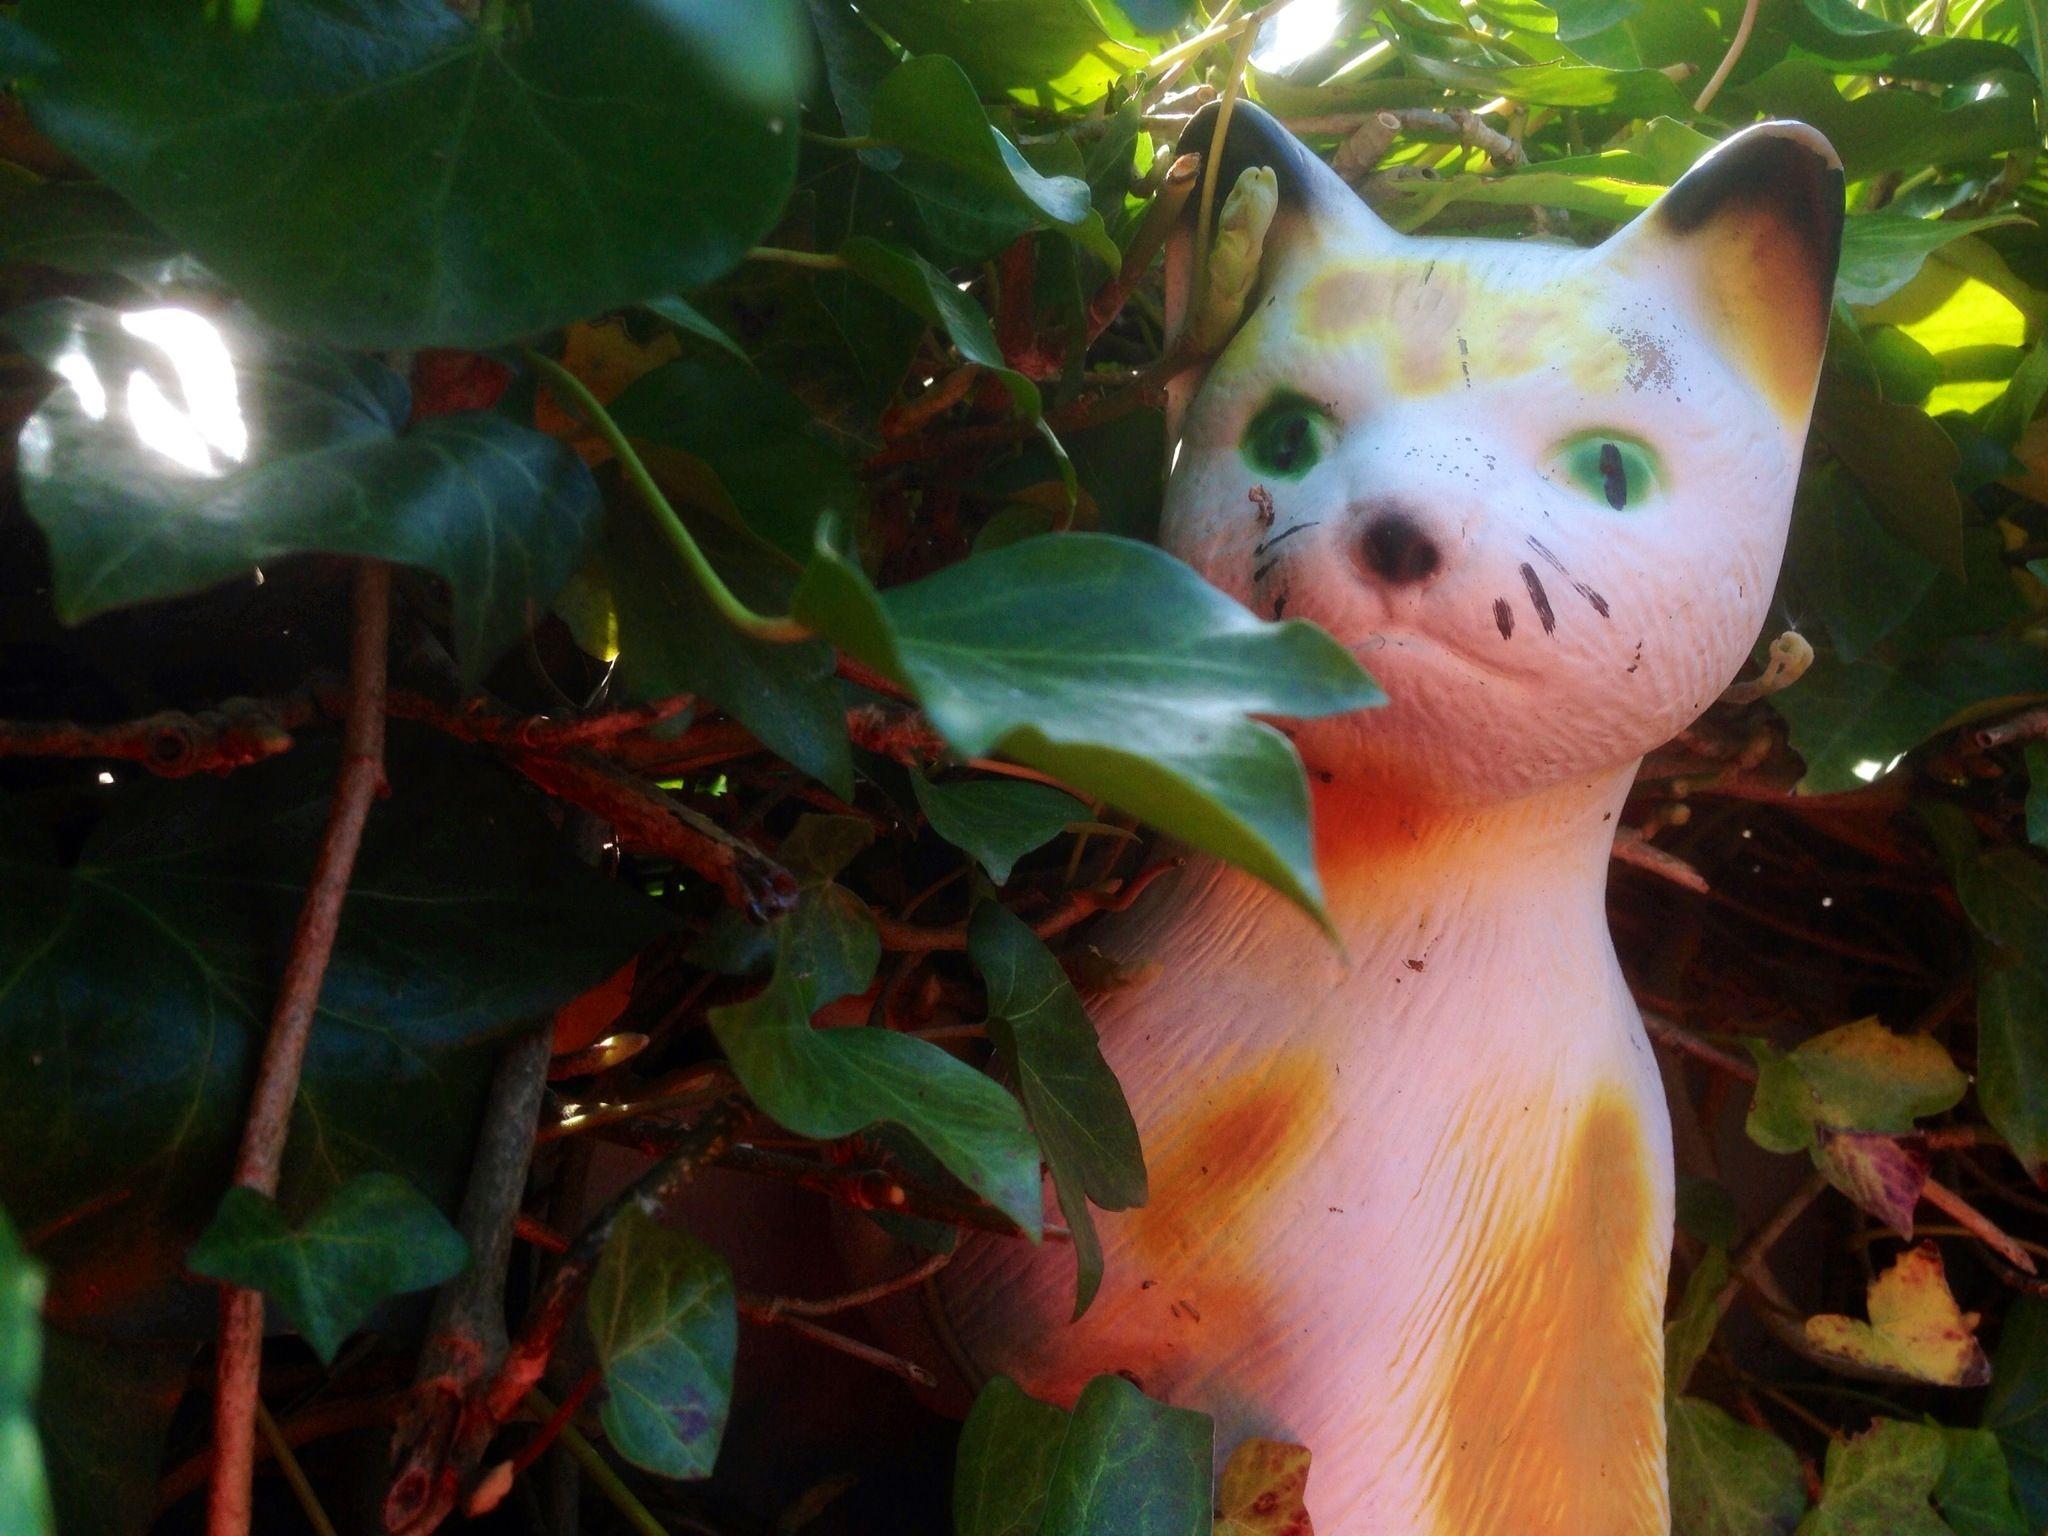 Our polish garden cat